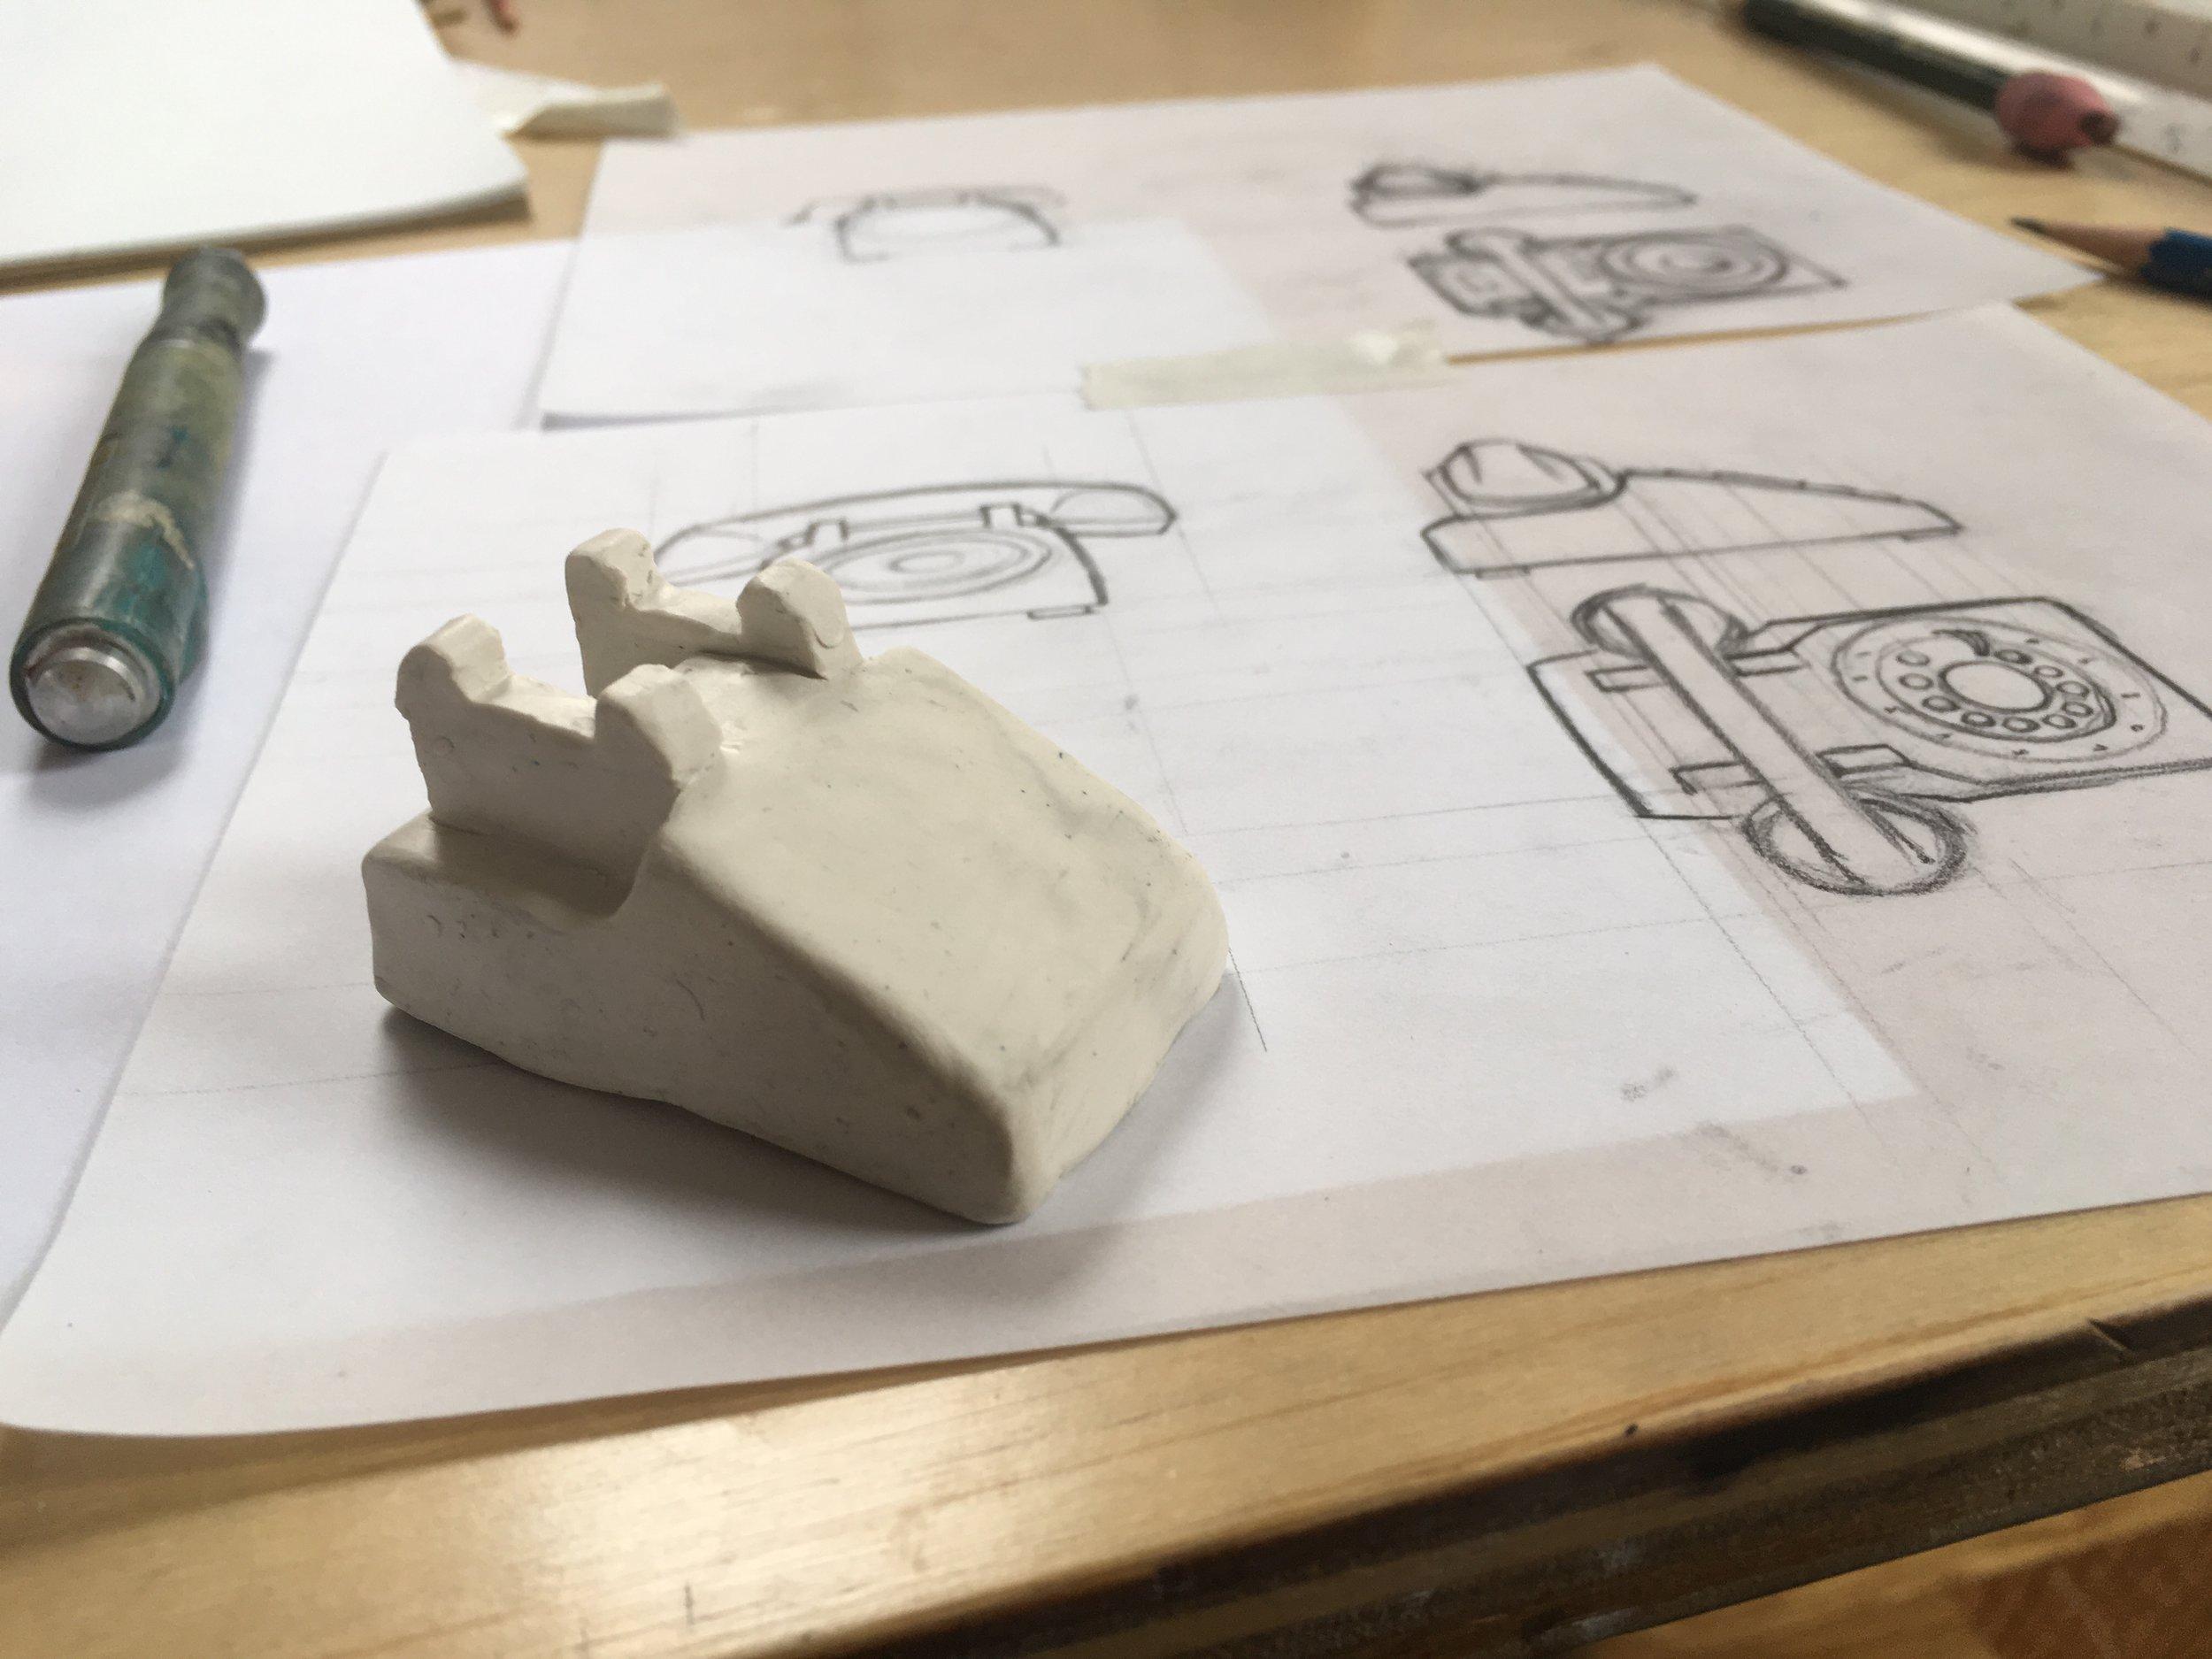 Building miniature phone.